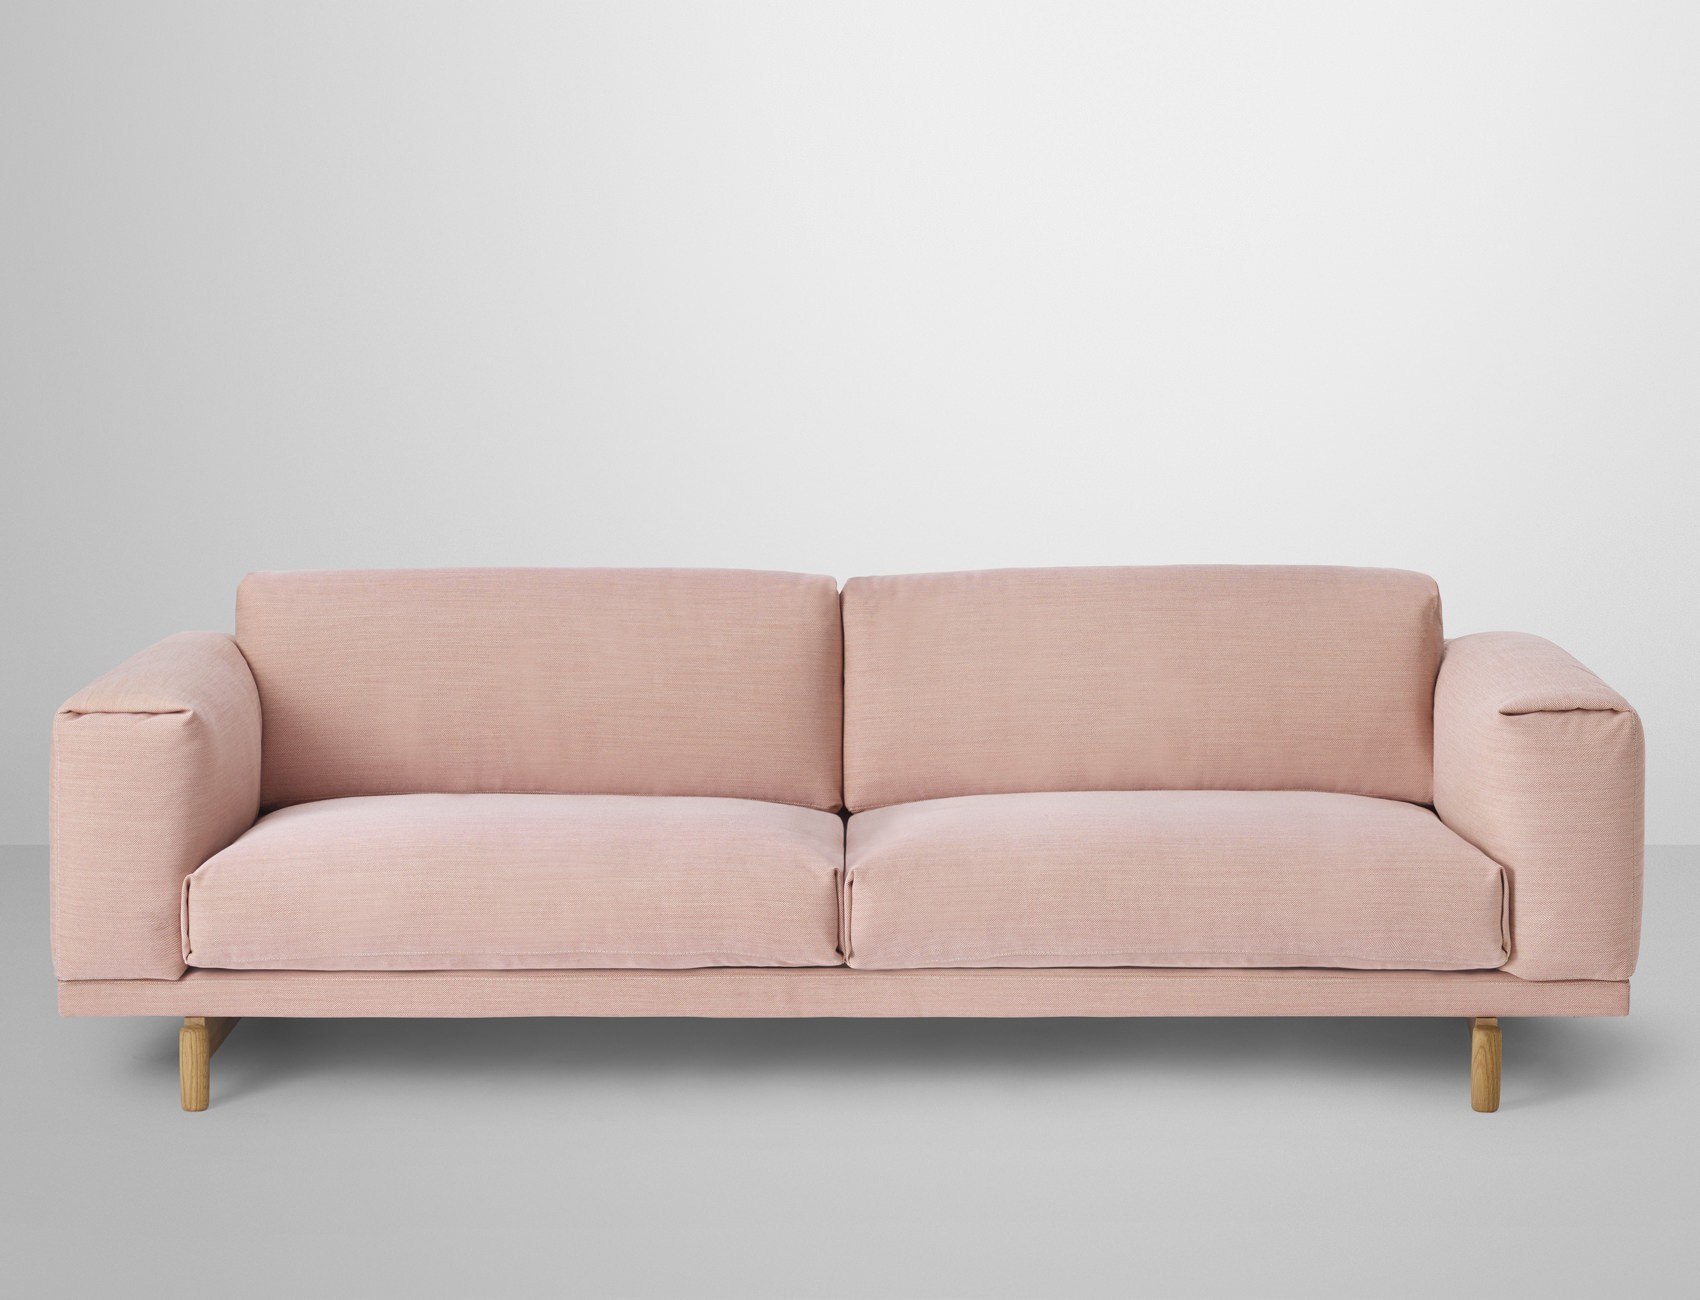 Muuto Rest Sofa : Muuto rest 3 seater sofa funktion alley